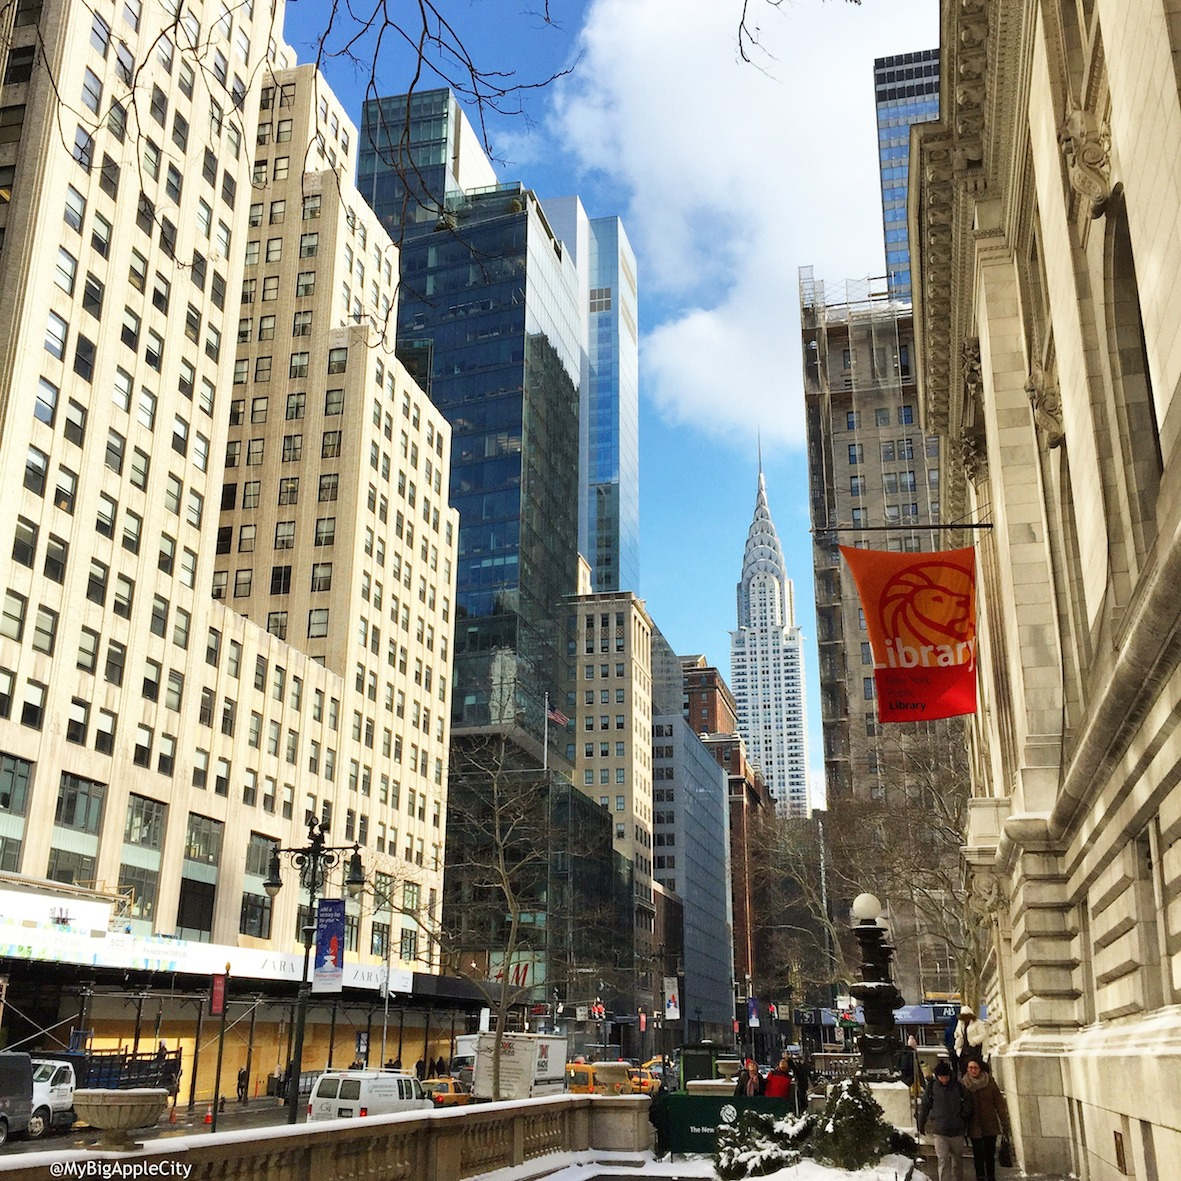 MyBigAppleCity-new-york-blog-travel-fifth-avenue